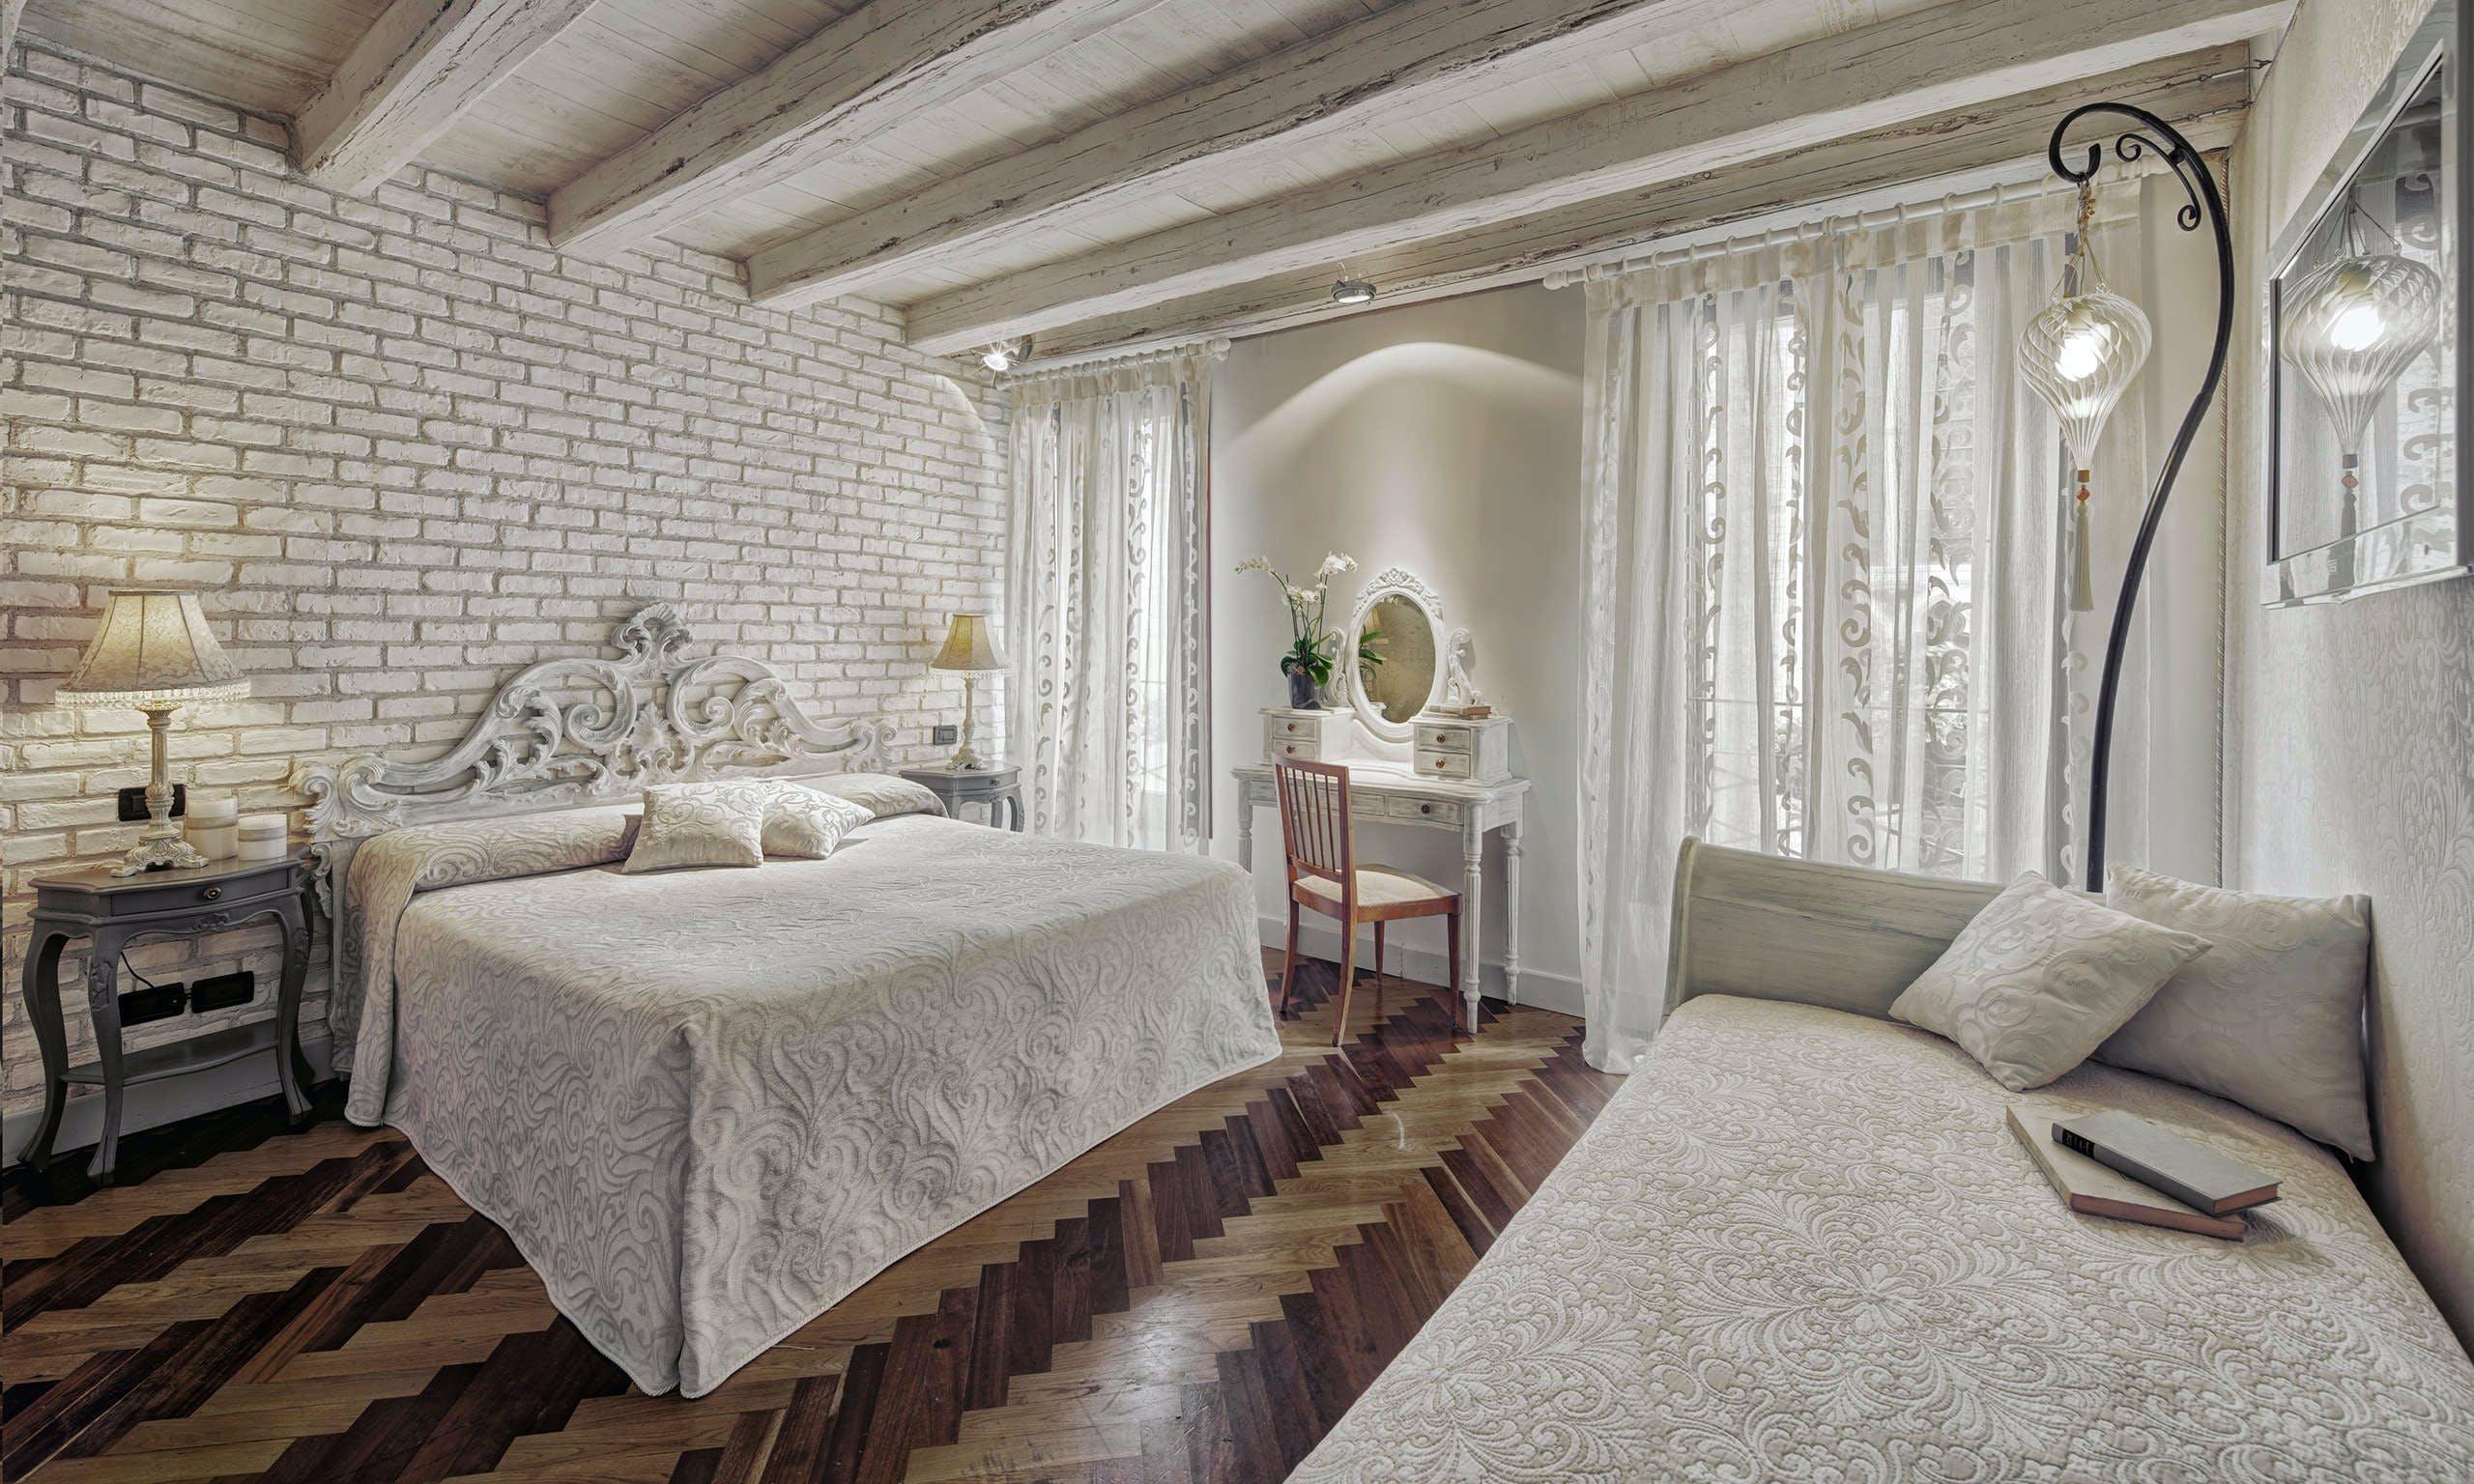 Last Minute Hotel Deals In Treviso Hoteltonight